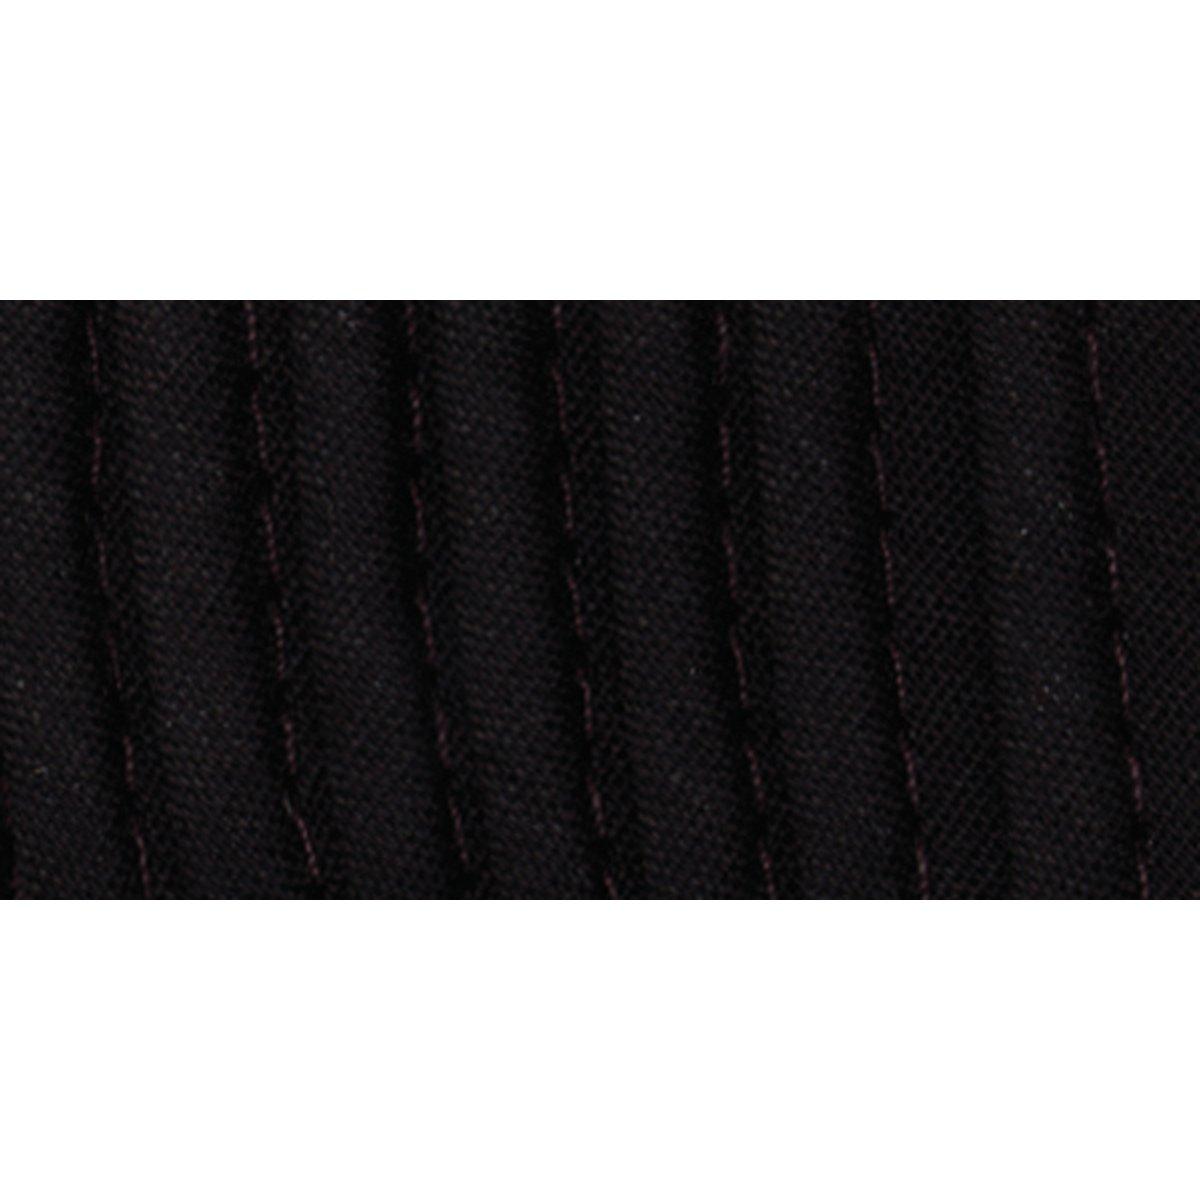 Black 2.5-Yard Wrights 117-303-031 Maxi Piping Bias Tape